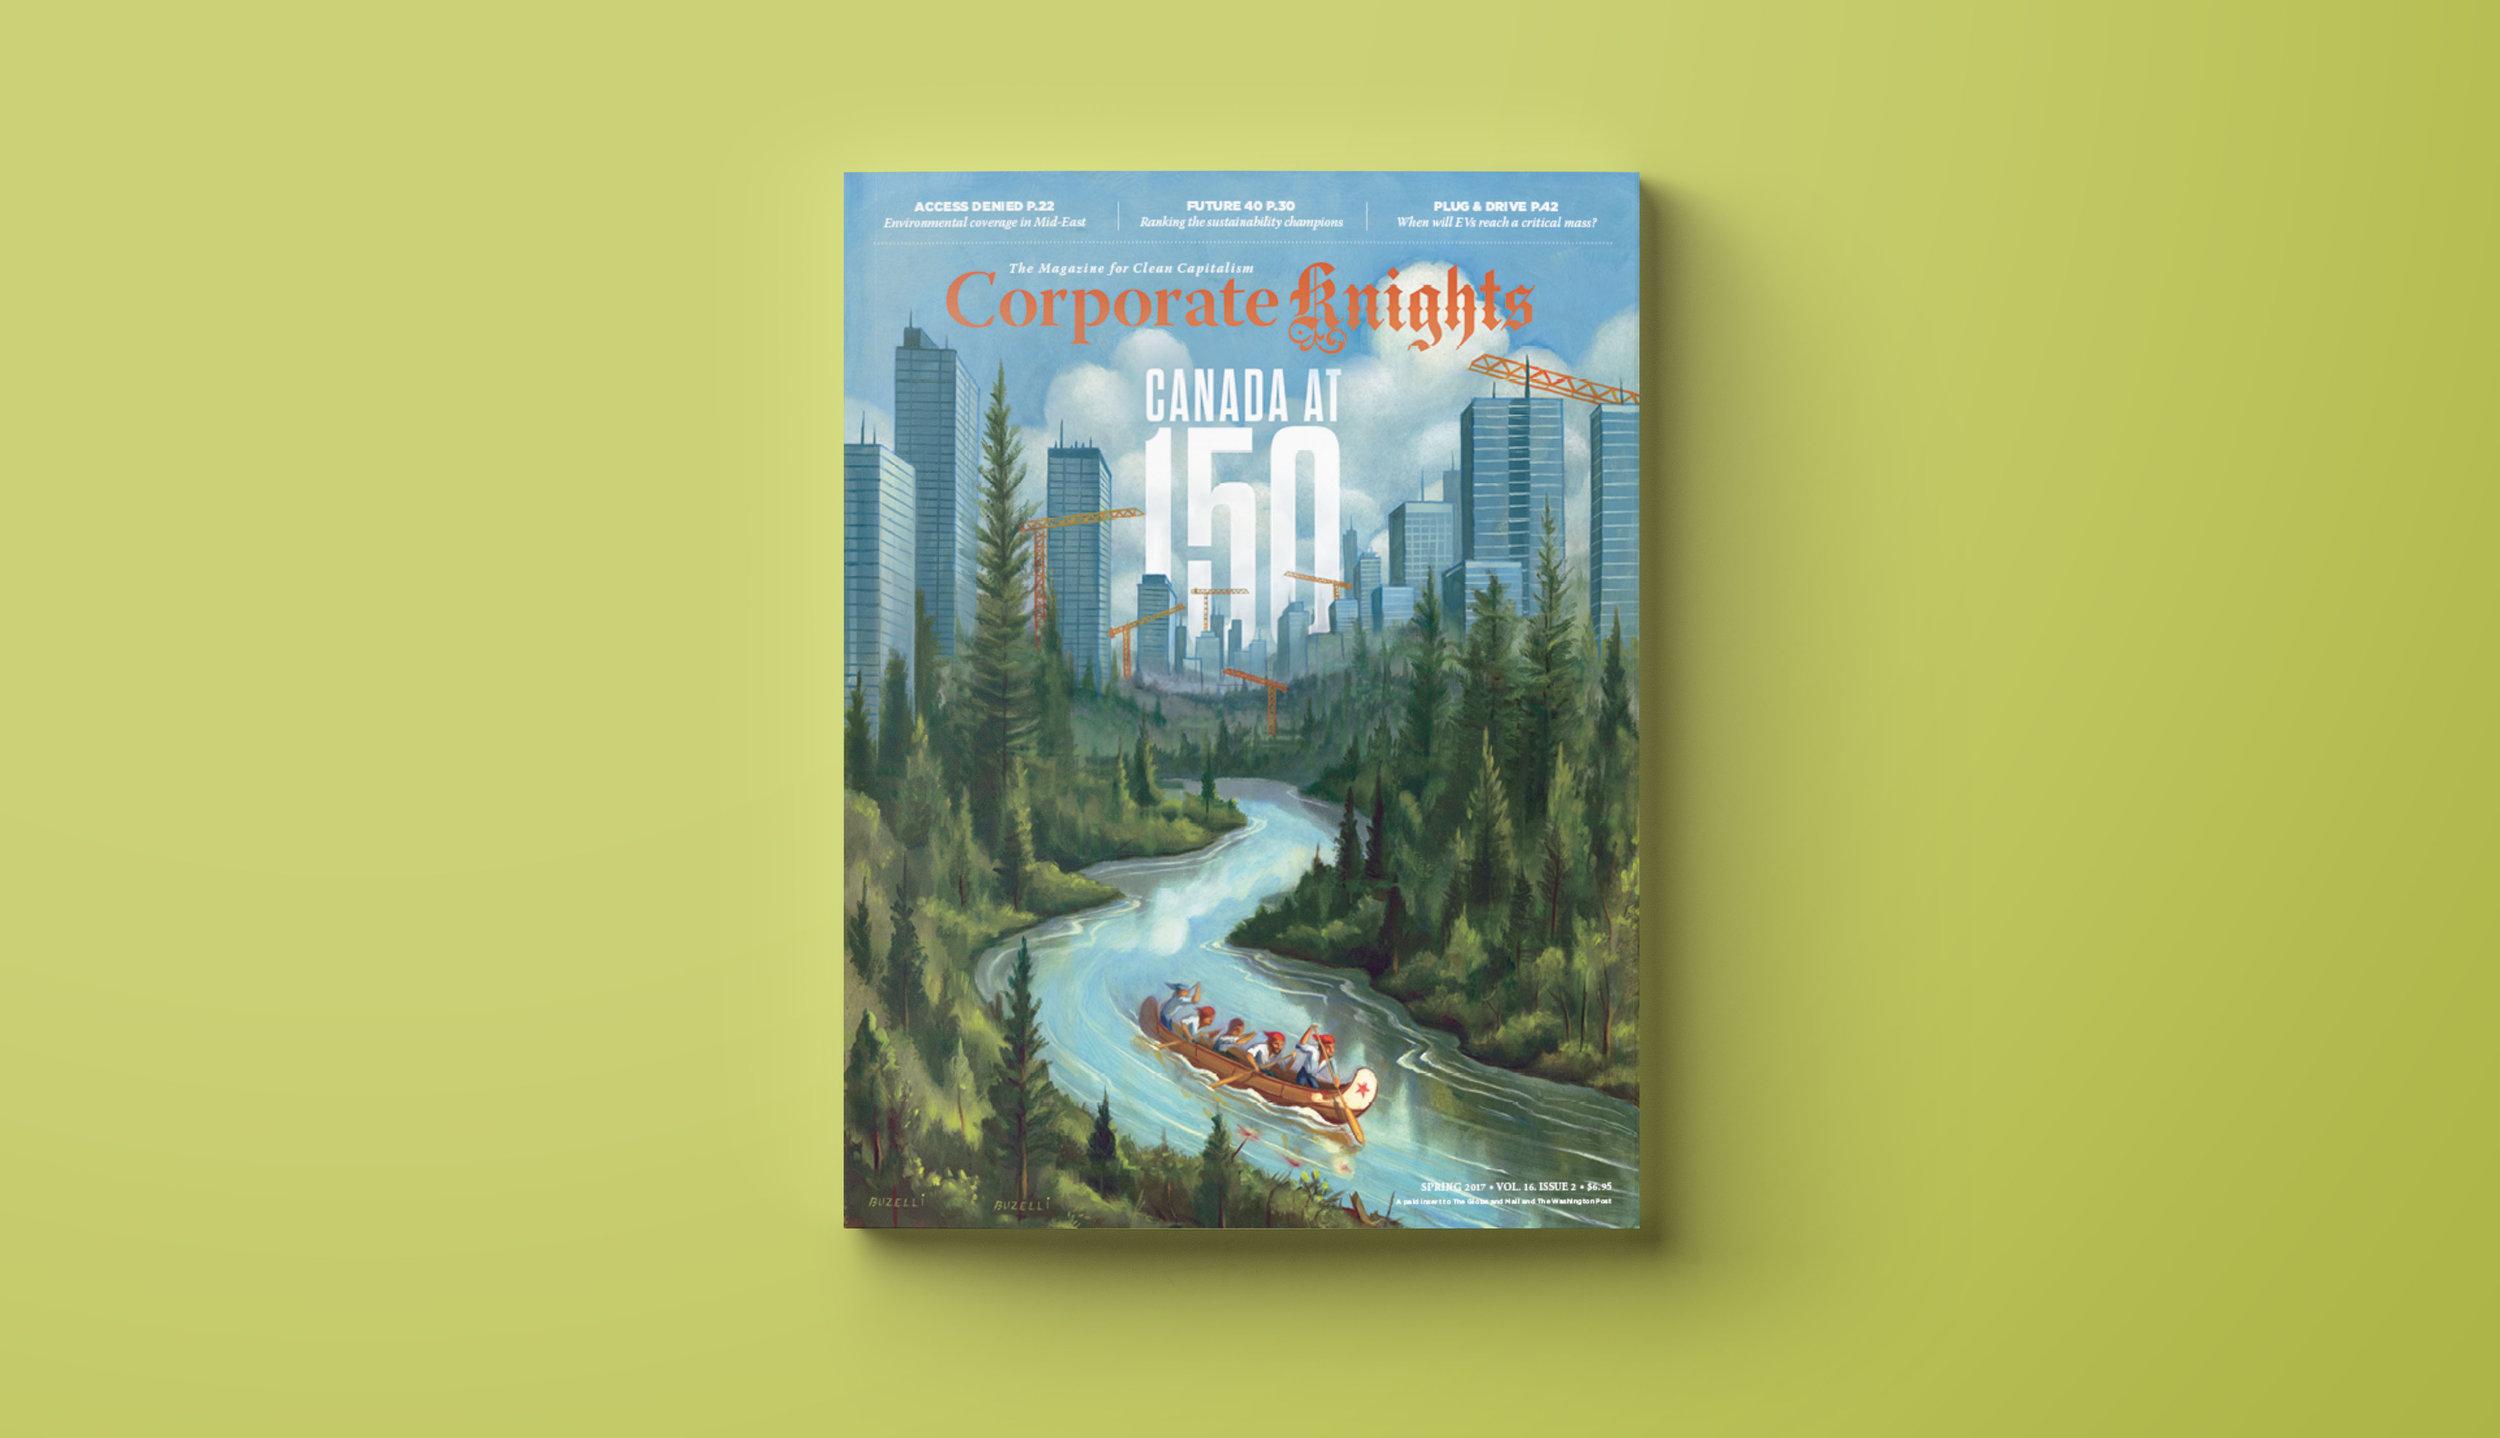 Magazine-USLetter-A4-Mockup-TemplateCK_Canada150.jpg